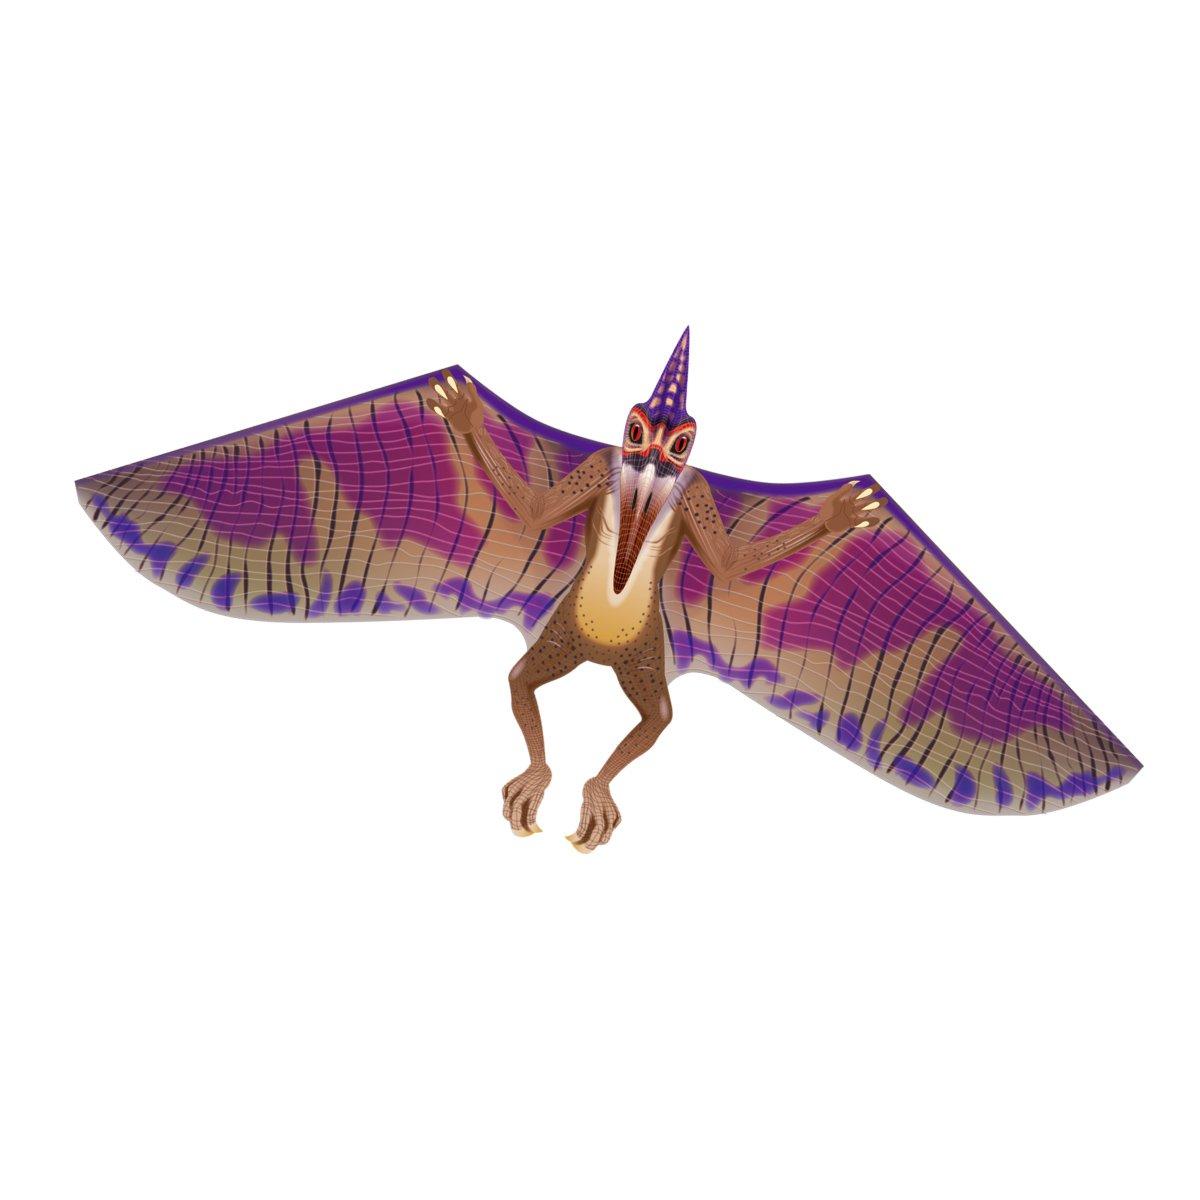 X-Kites WindNSun DinoSoars Pterodactyl Nylon Kite, 64'' by X-Kites